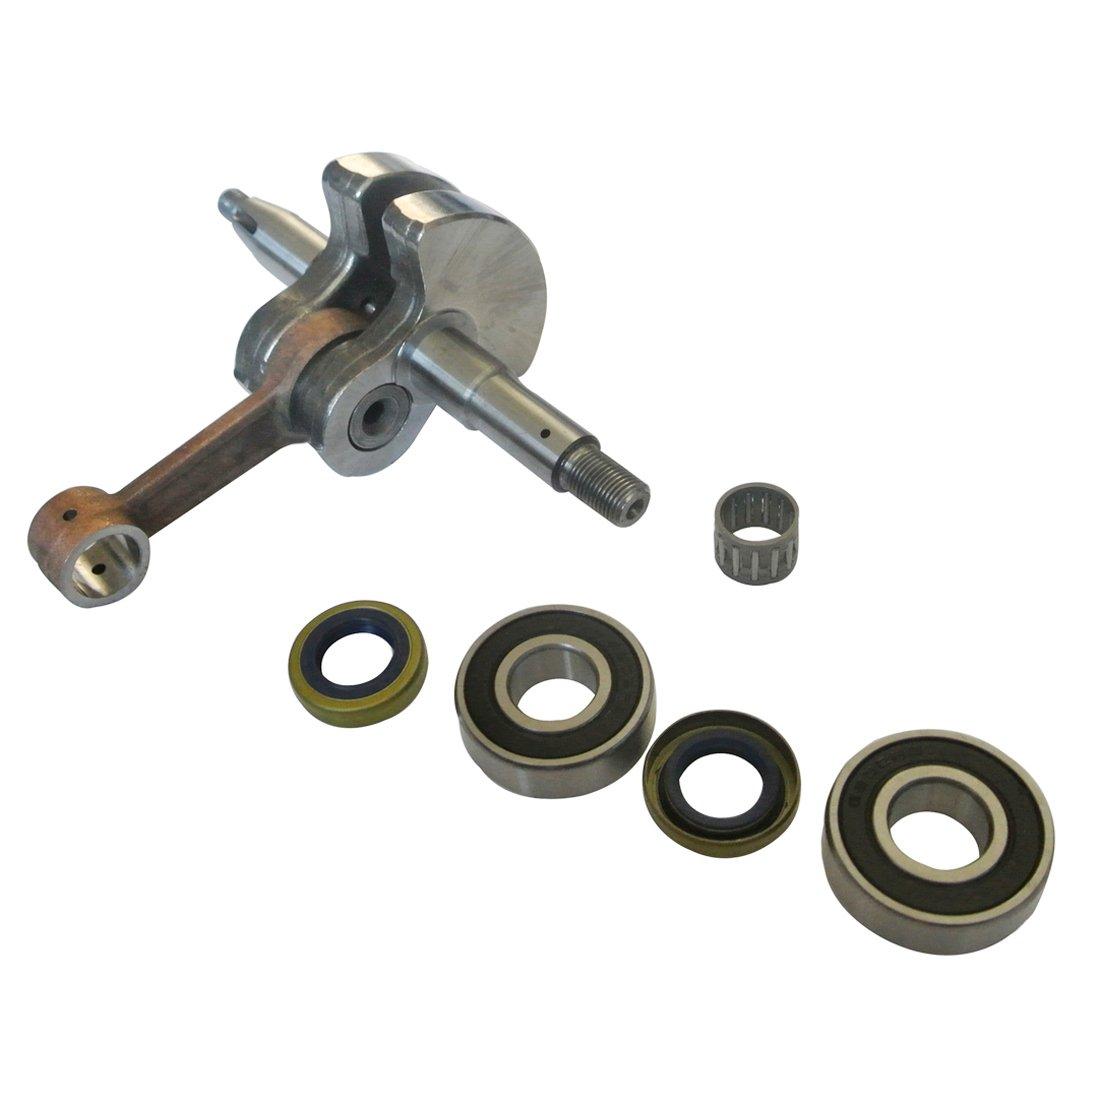 JRL Crankshaft & Bearings Oil Seals Piston Pin Bearing for Husqvarna 266 268 66 272